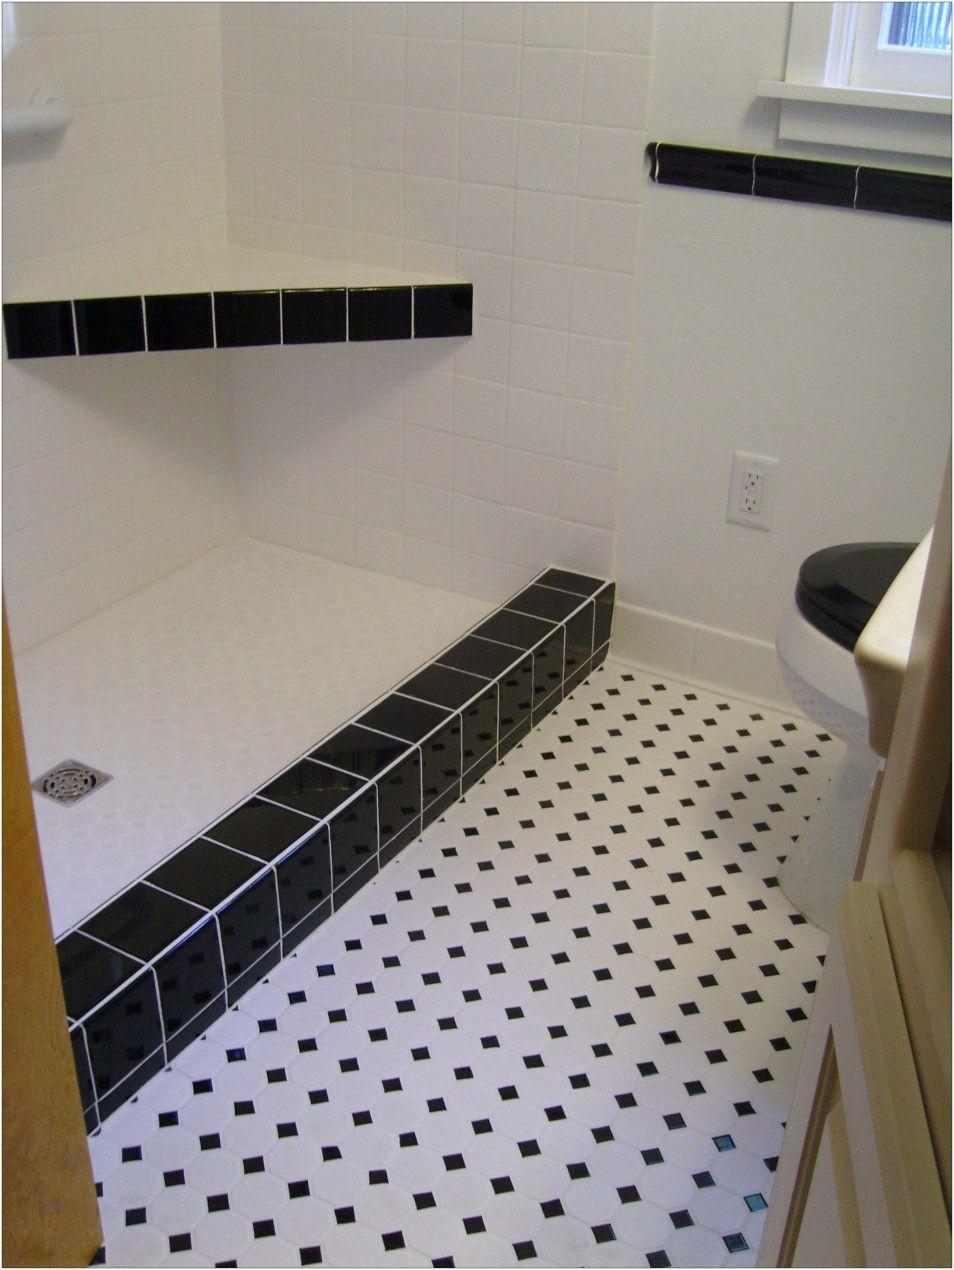 Bathroom tile sale - Bathroom Tile Patterns With A Simple Pattern Tiling Bathroom Floor Black And White Bathroom Tile Ideas